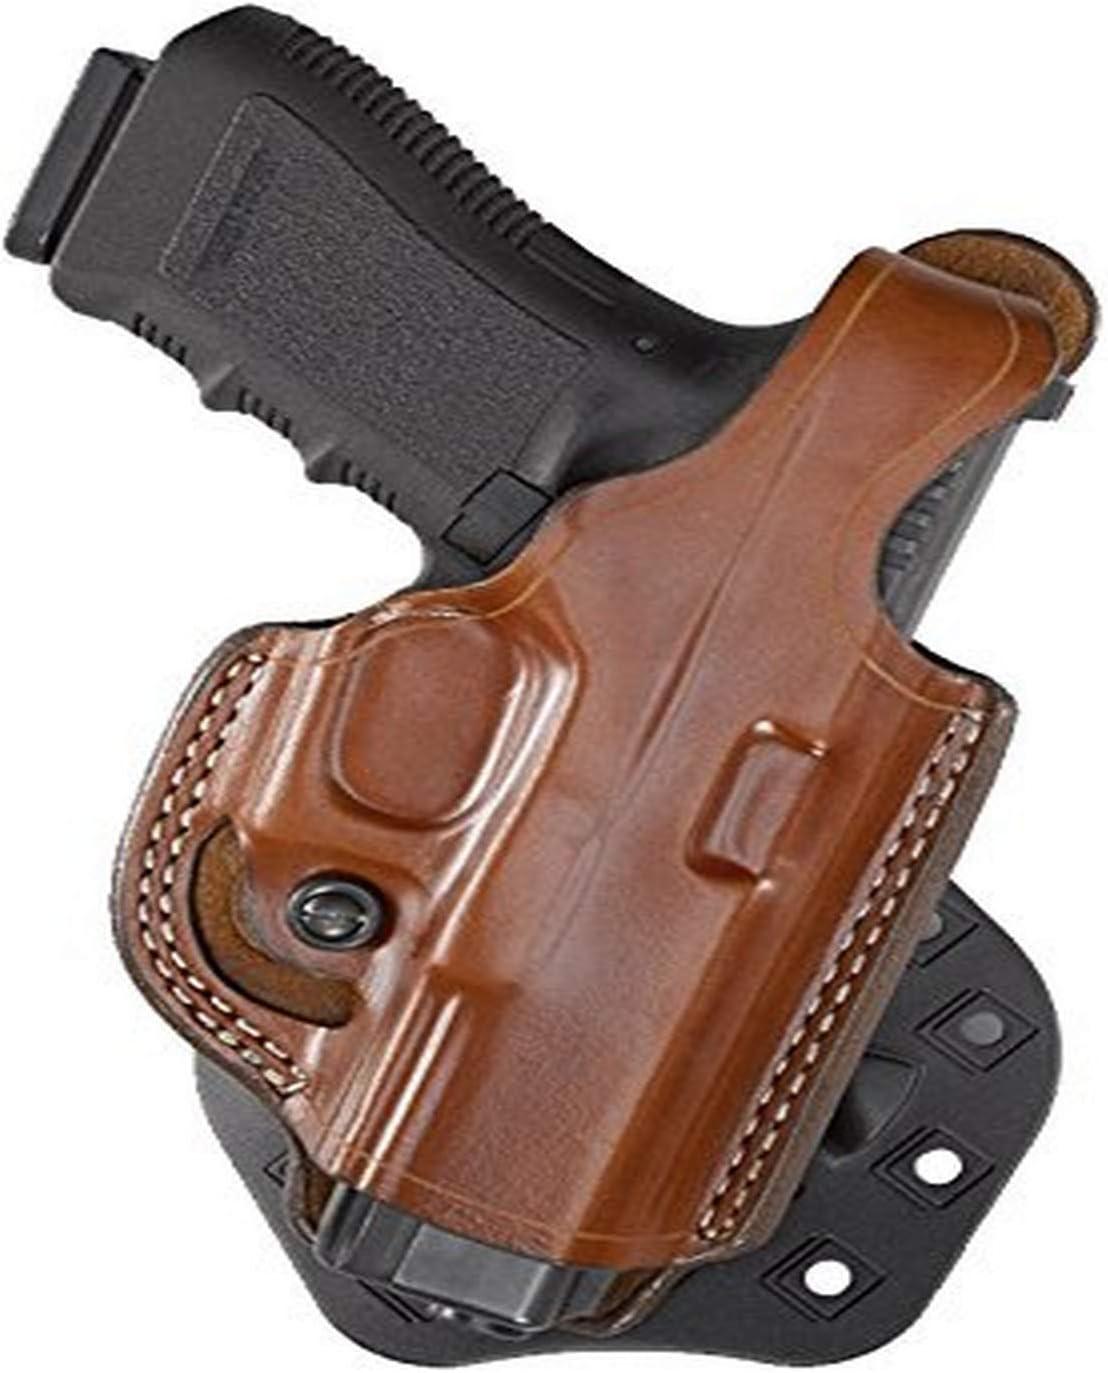 Aker H101TPRU-GL1719 Tan Comfort-Flex Shoulder RH Gun Holster Fits Glock 17 19